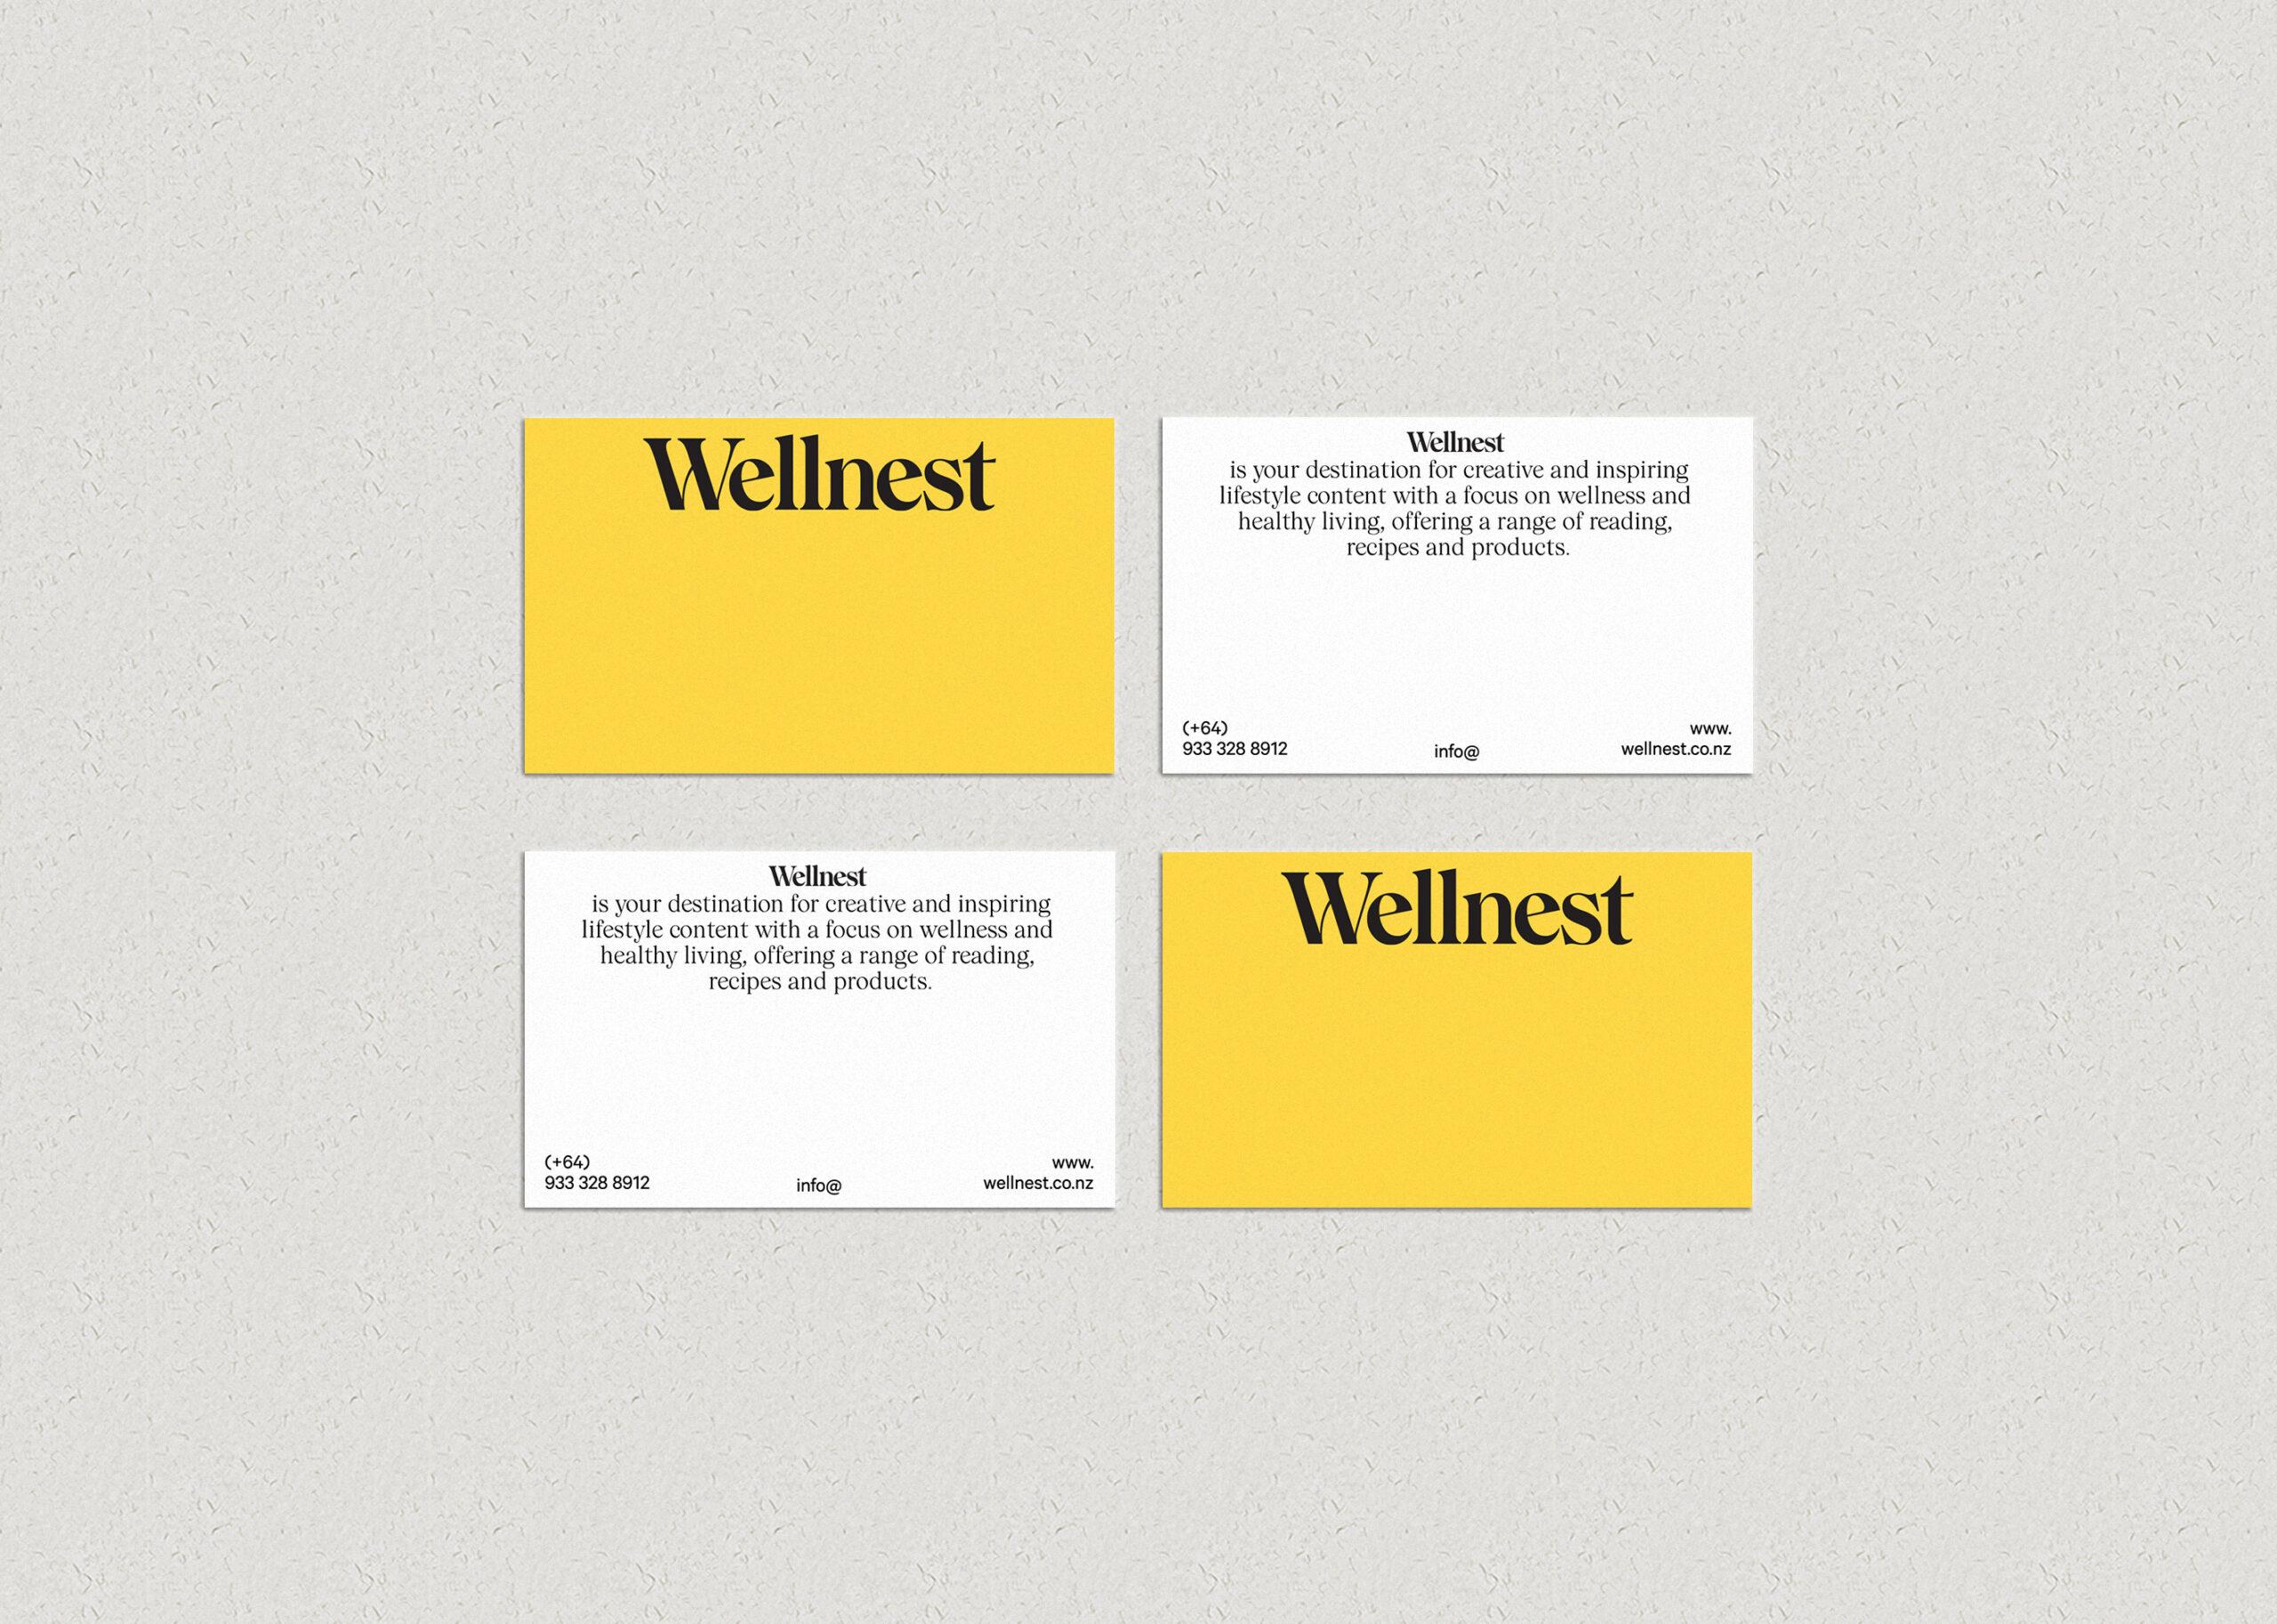 SCC_Wellnest_Stationary_02